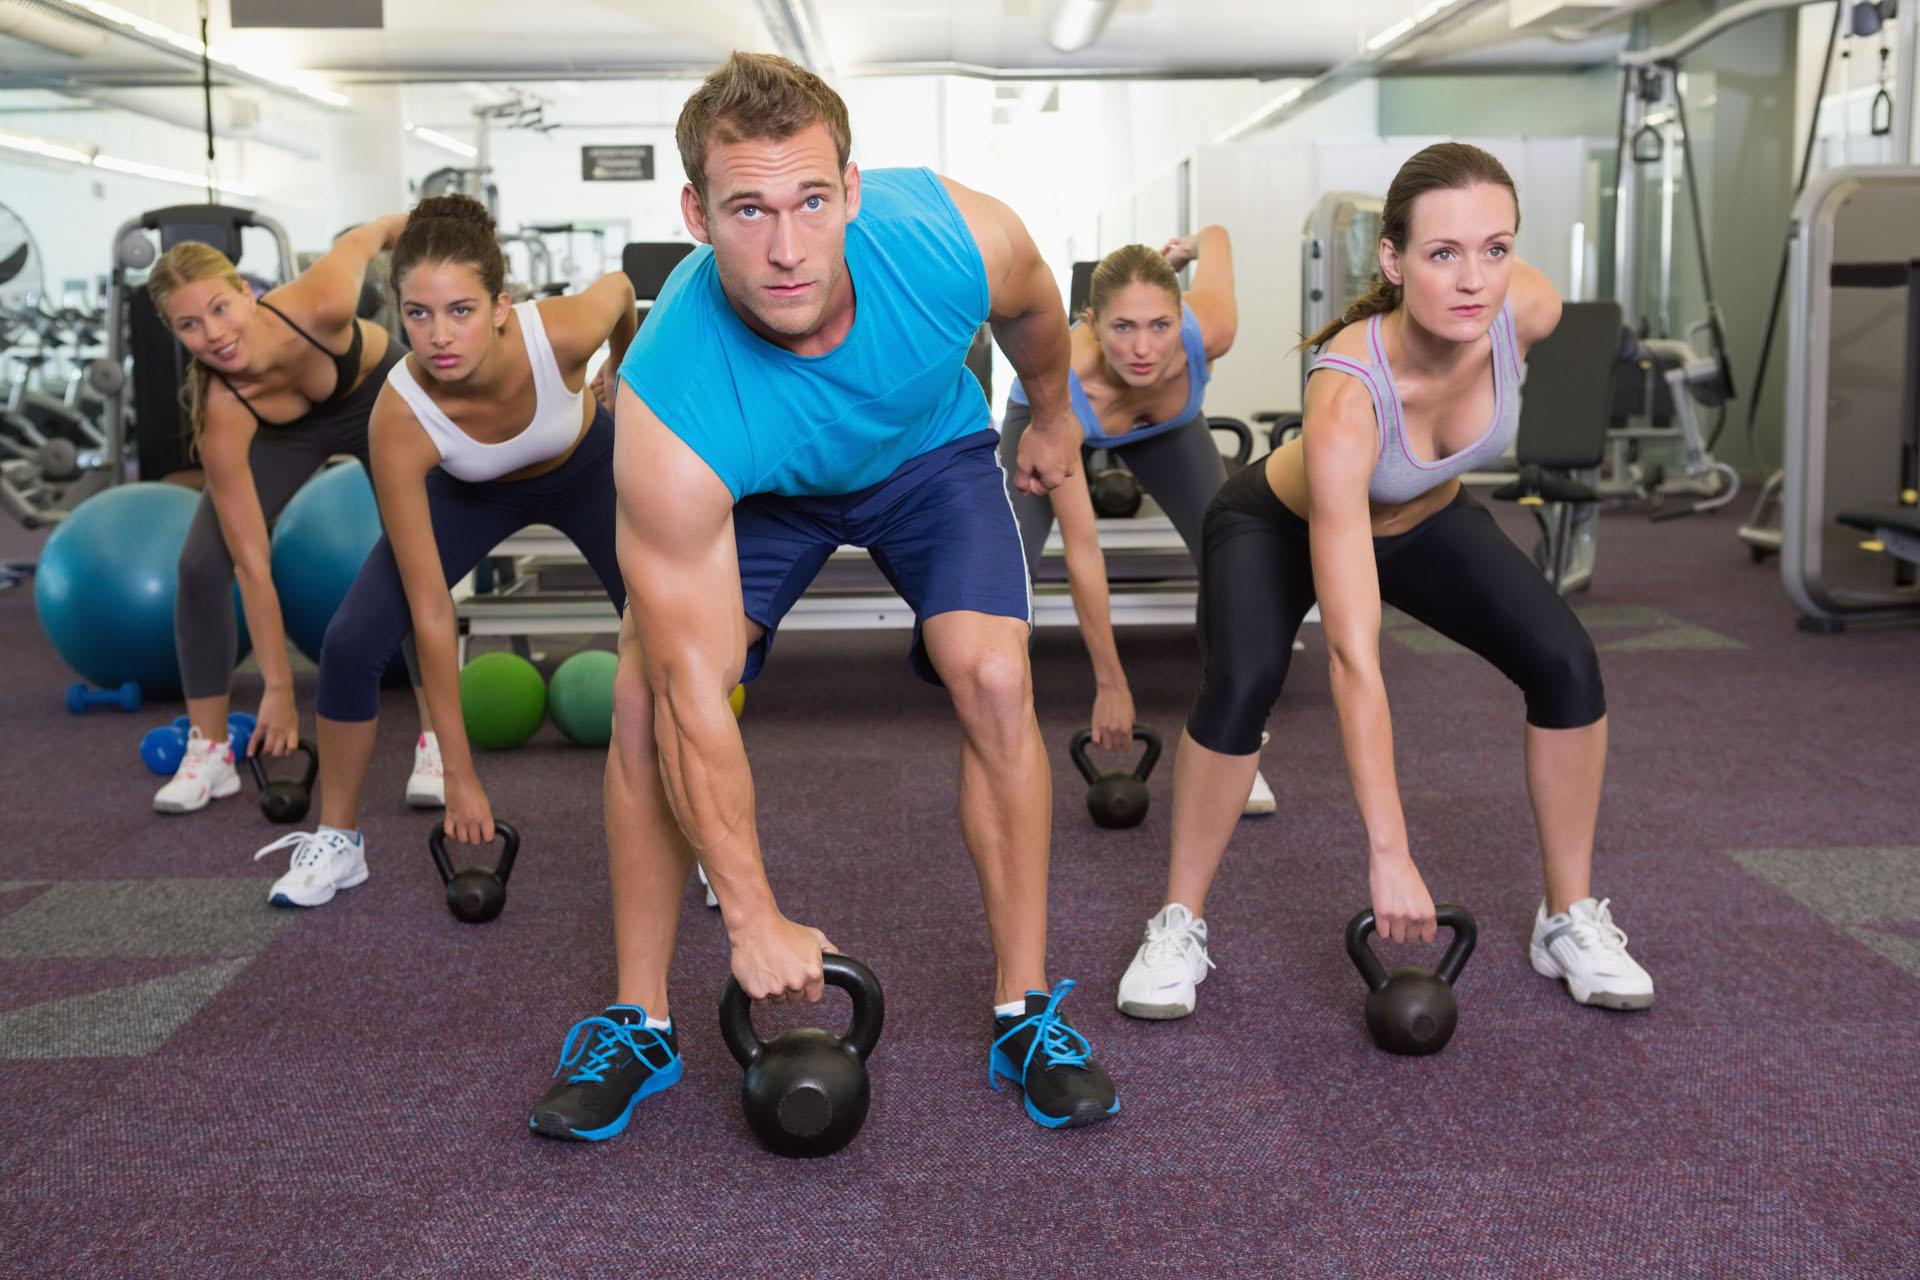 Muscular instructor leading kettlebell class